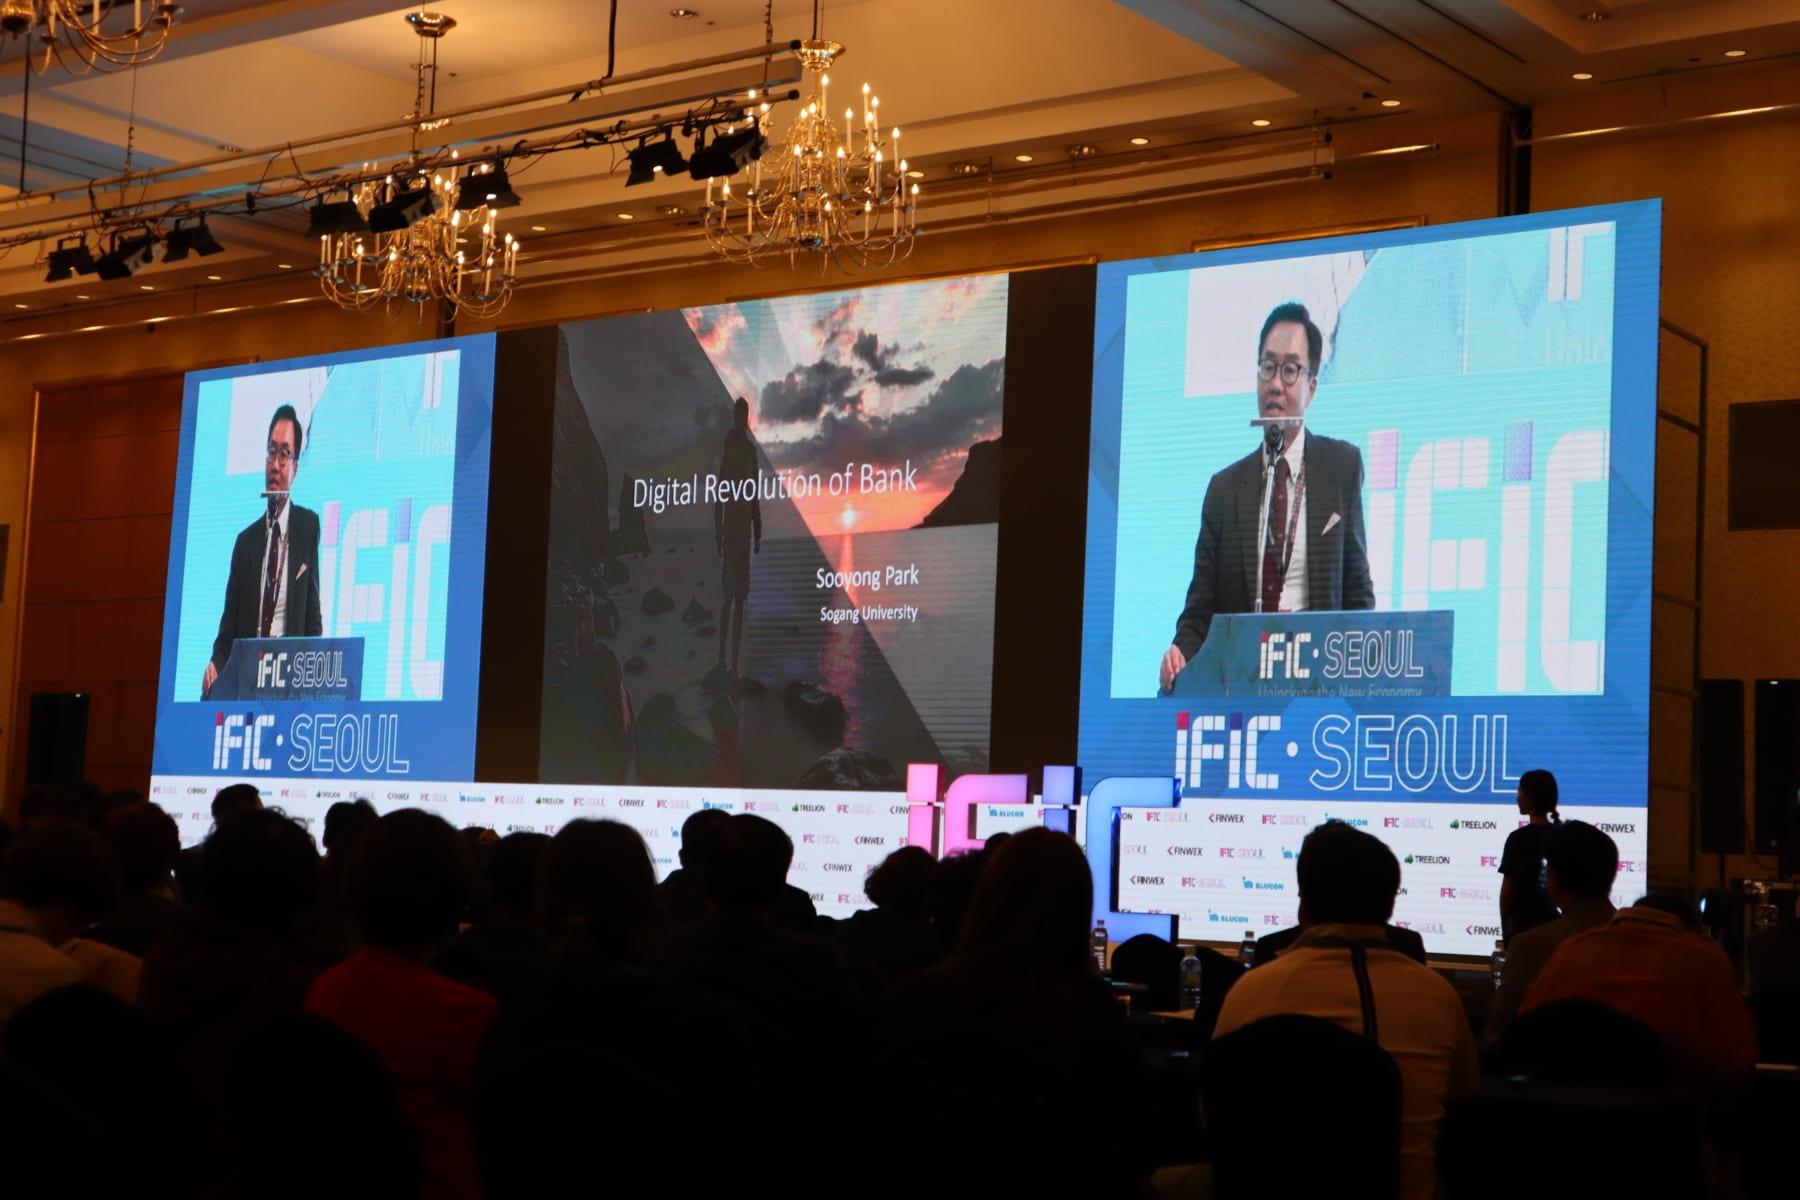 IFIC 2019 컨퍼런스, 블록체인 거장들과 함께 새로운 시대를 논하다